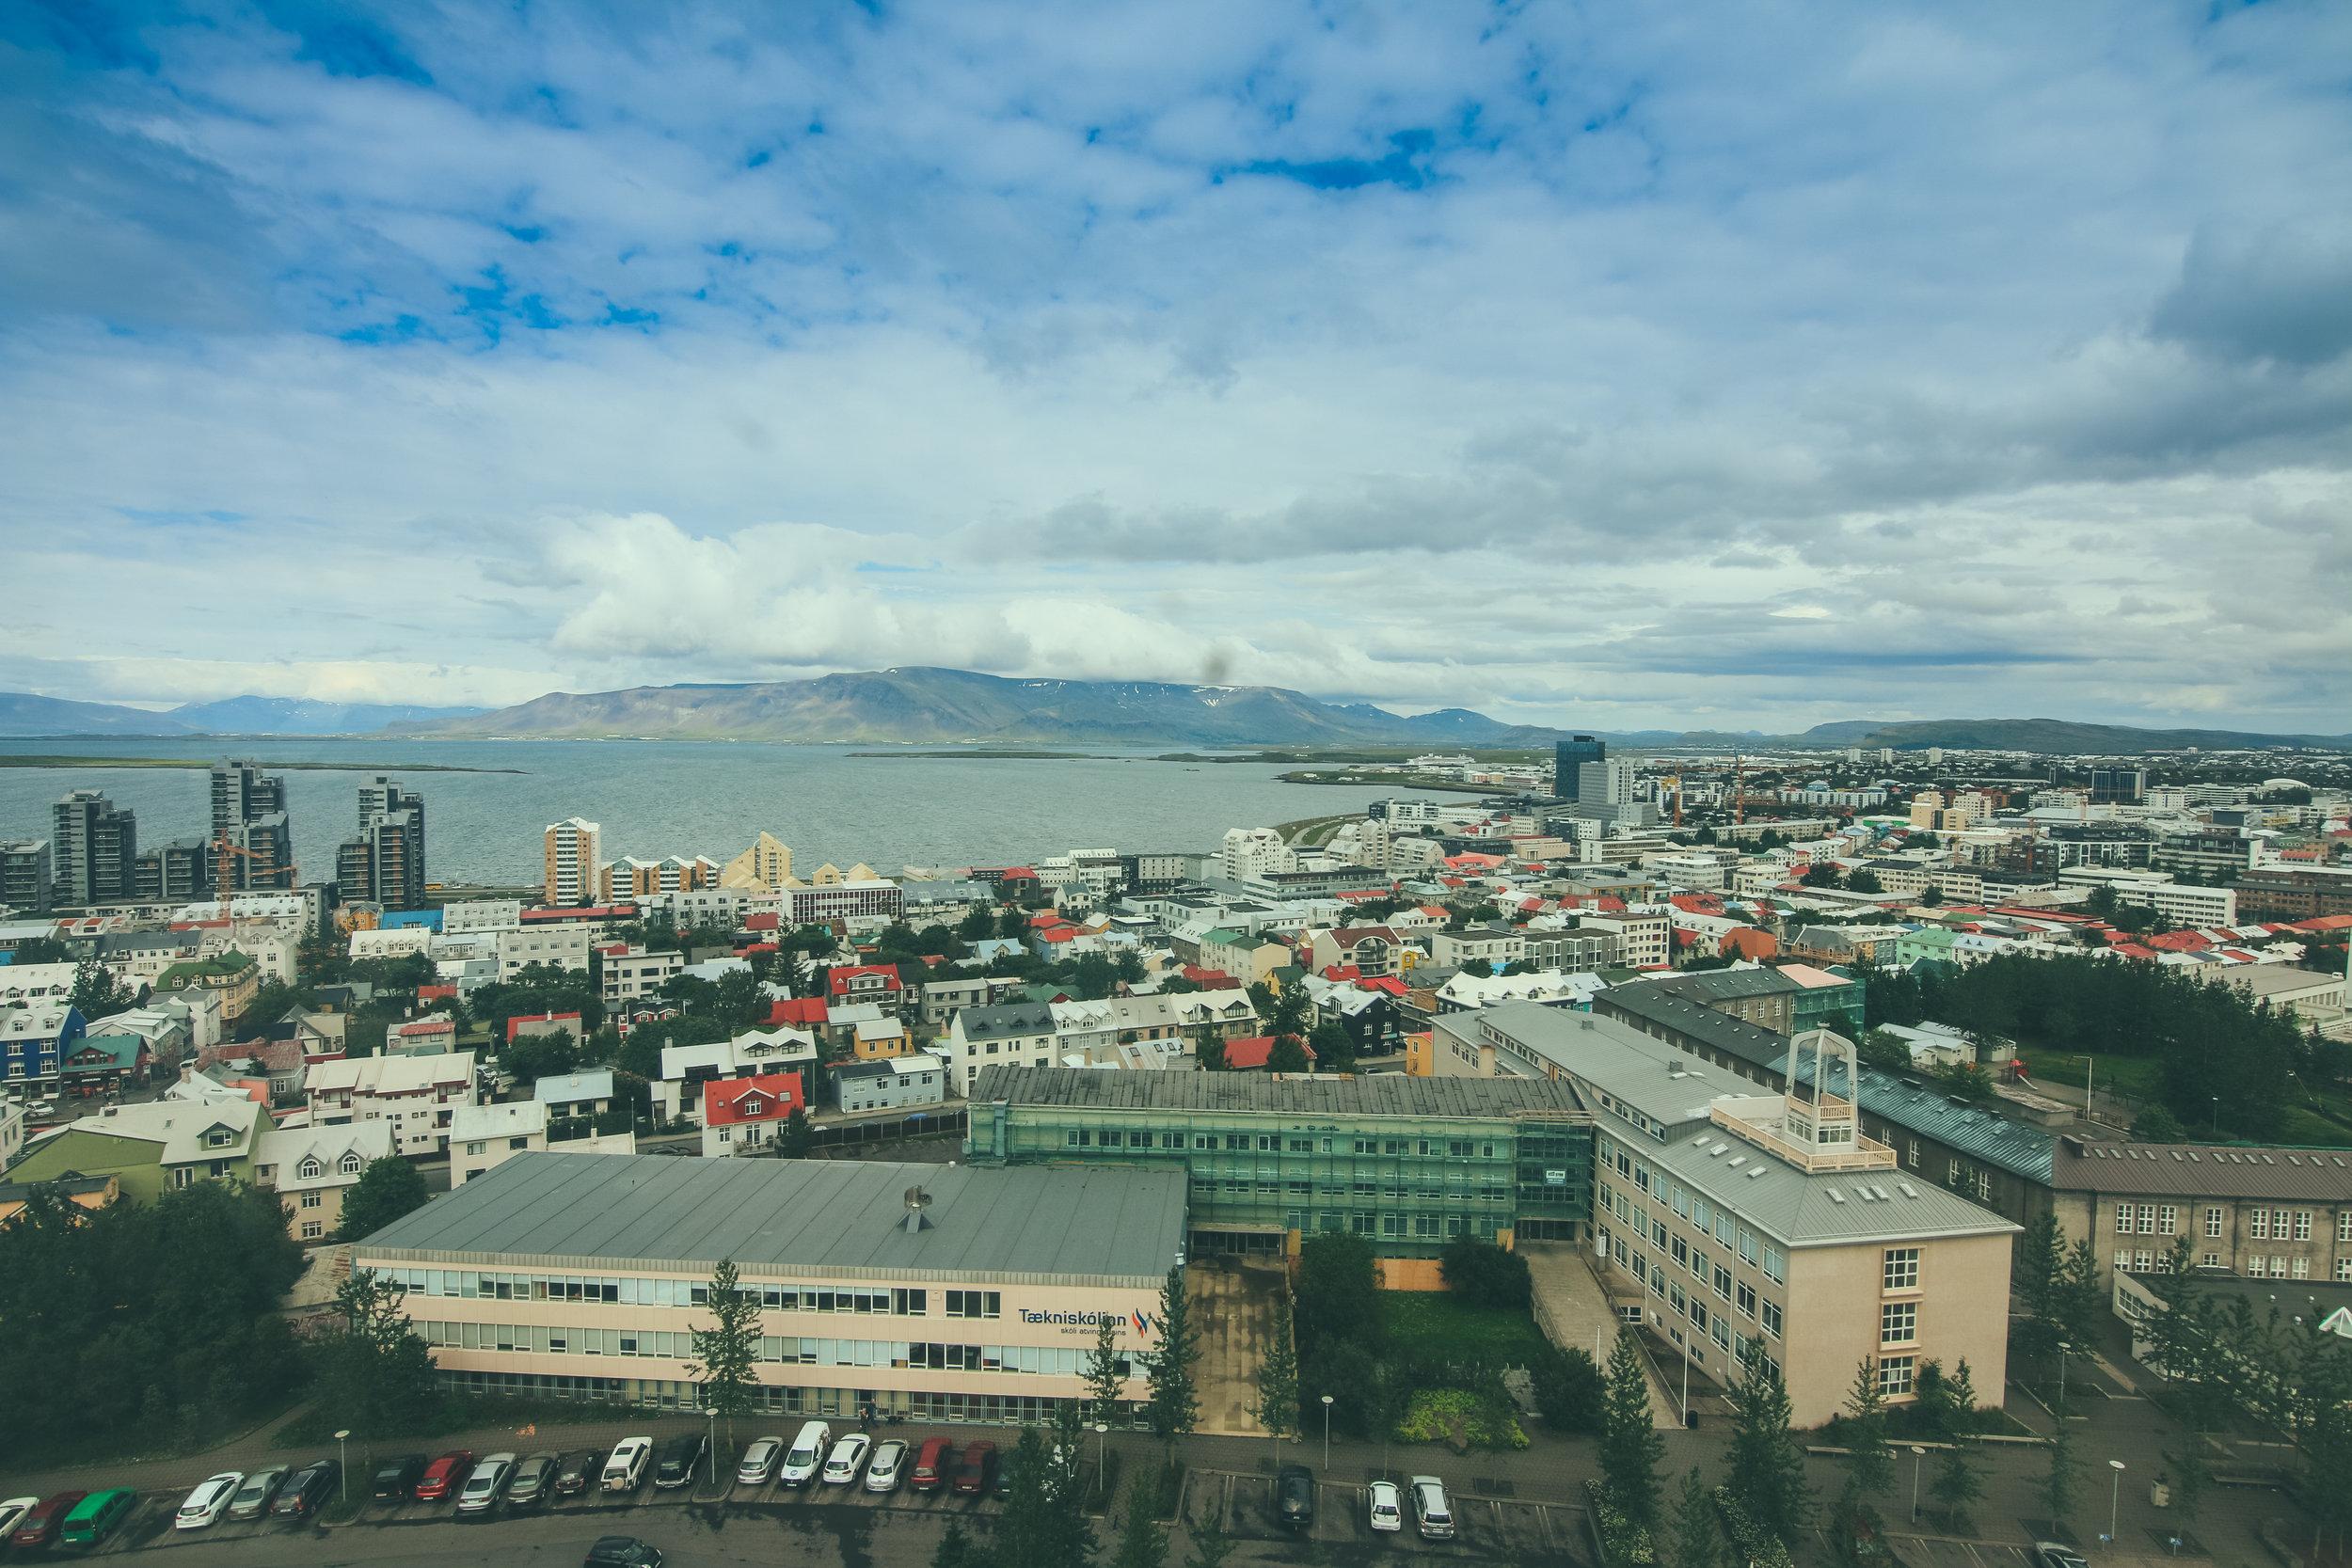 Reykjavic